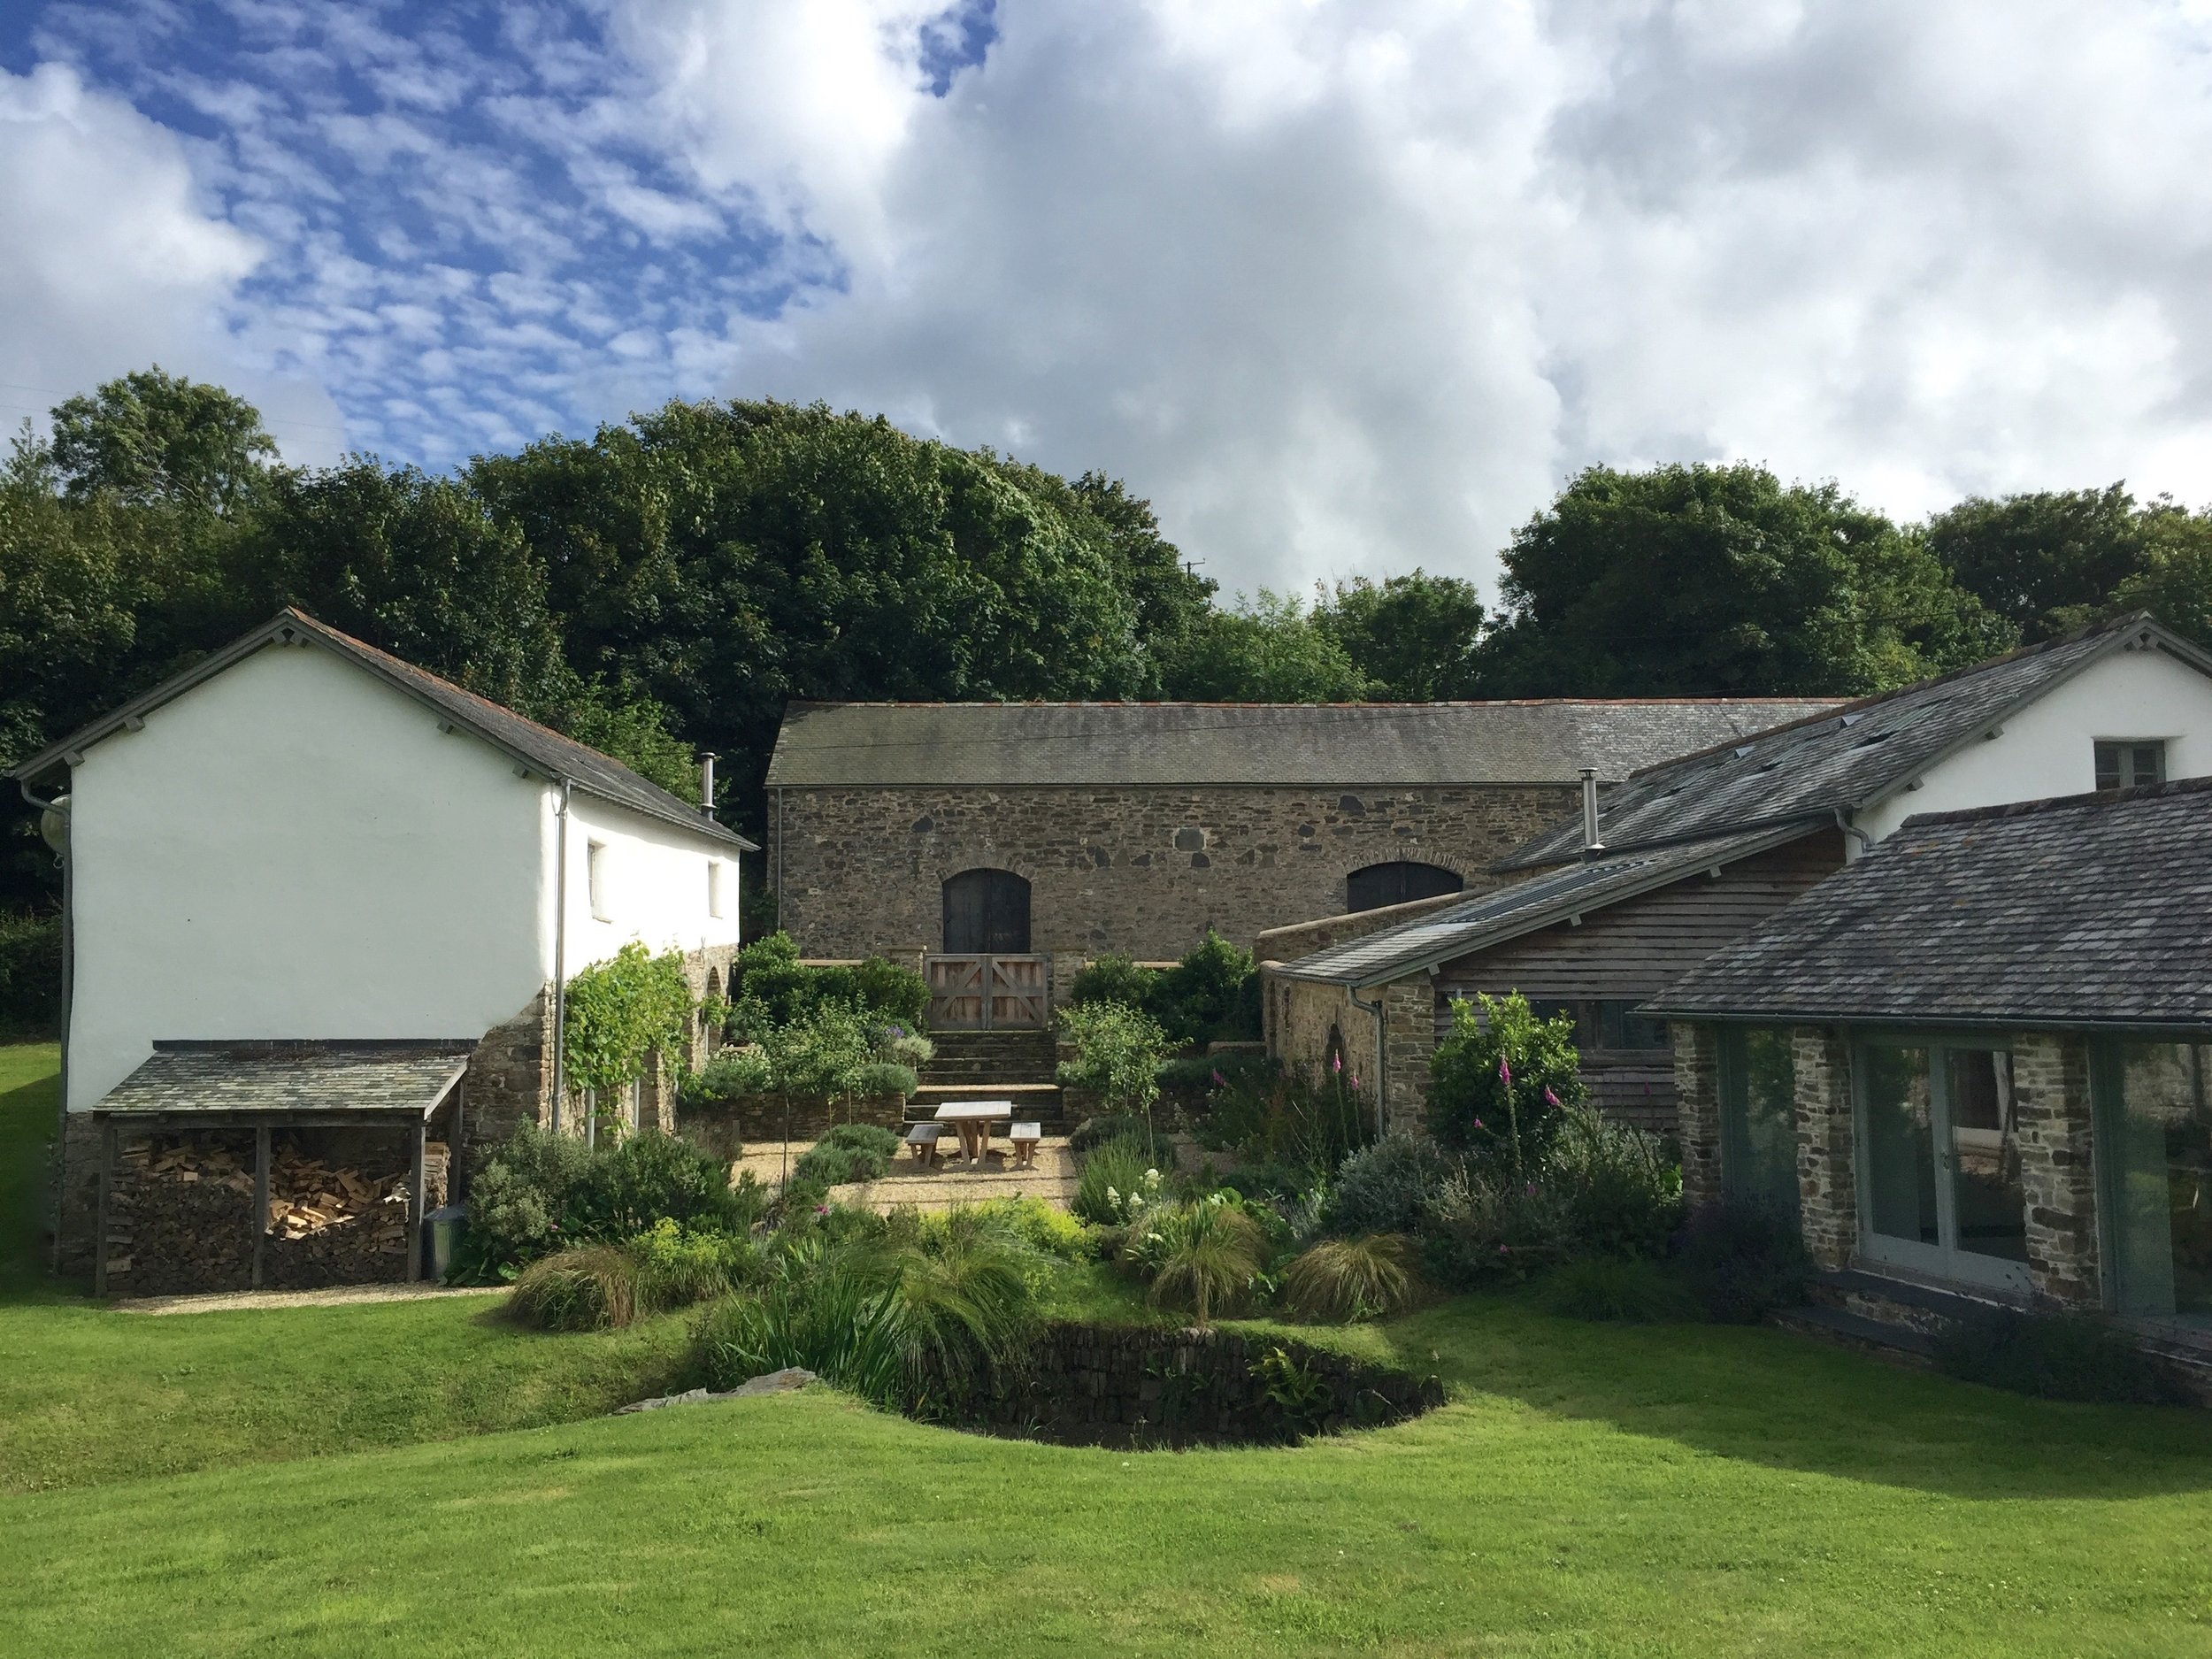 Upcott Farm Calfshed Courtyard